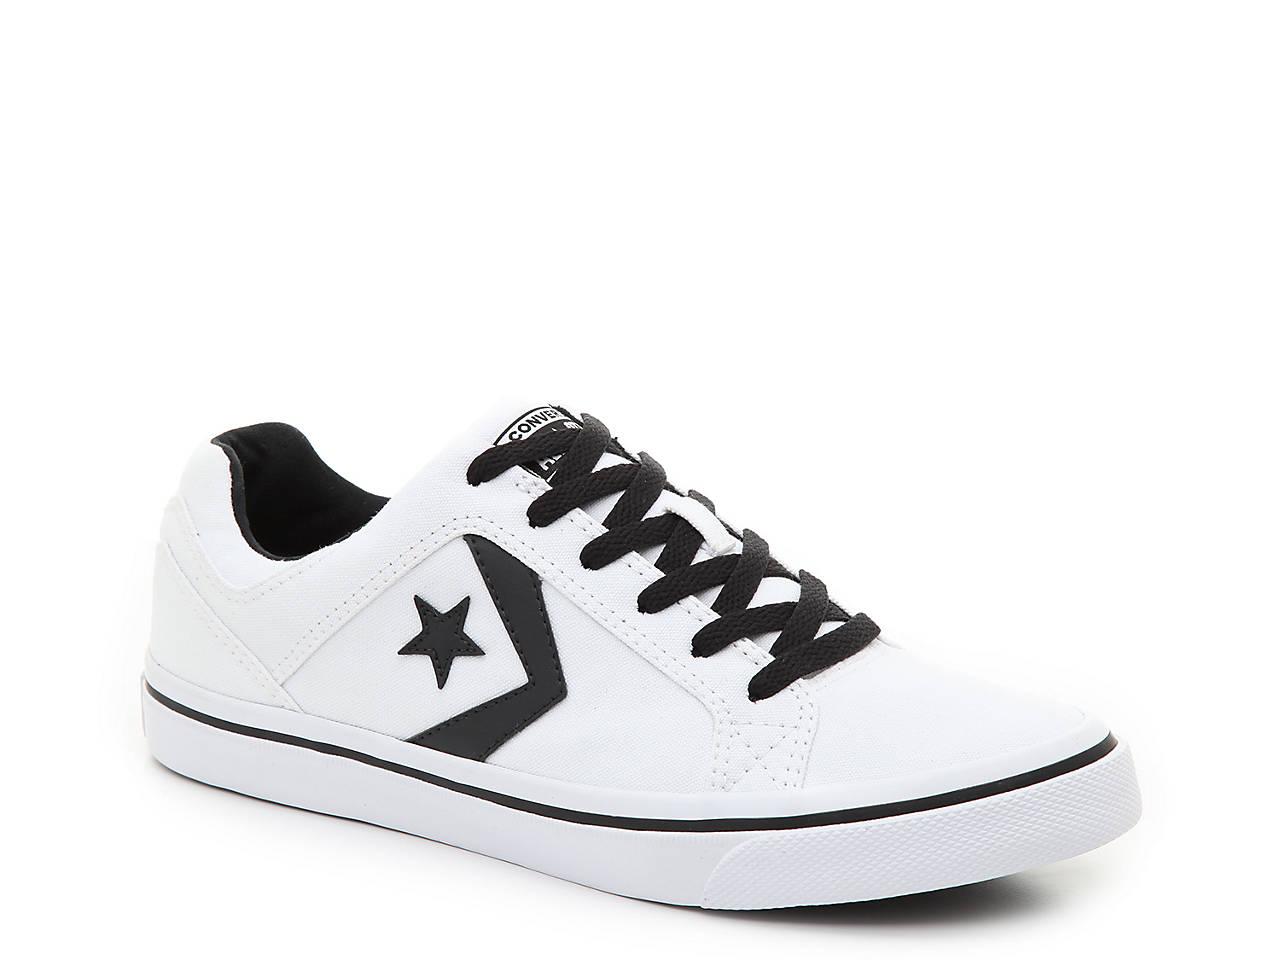 eecddb0efd43 Converse El Distrito Sneaker - Men s Men s Shoes